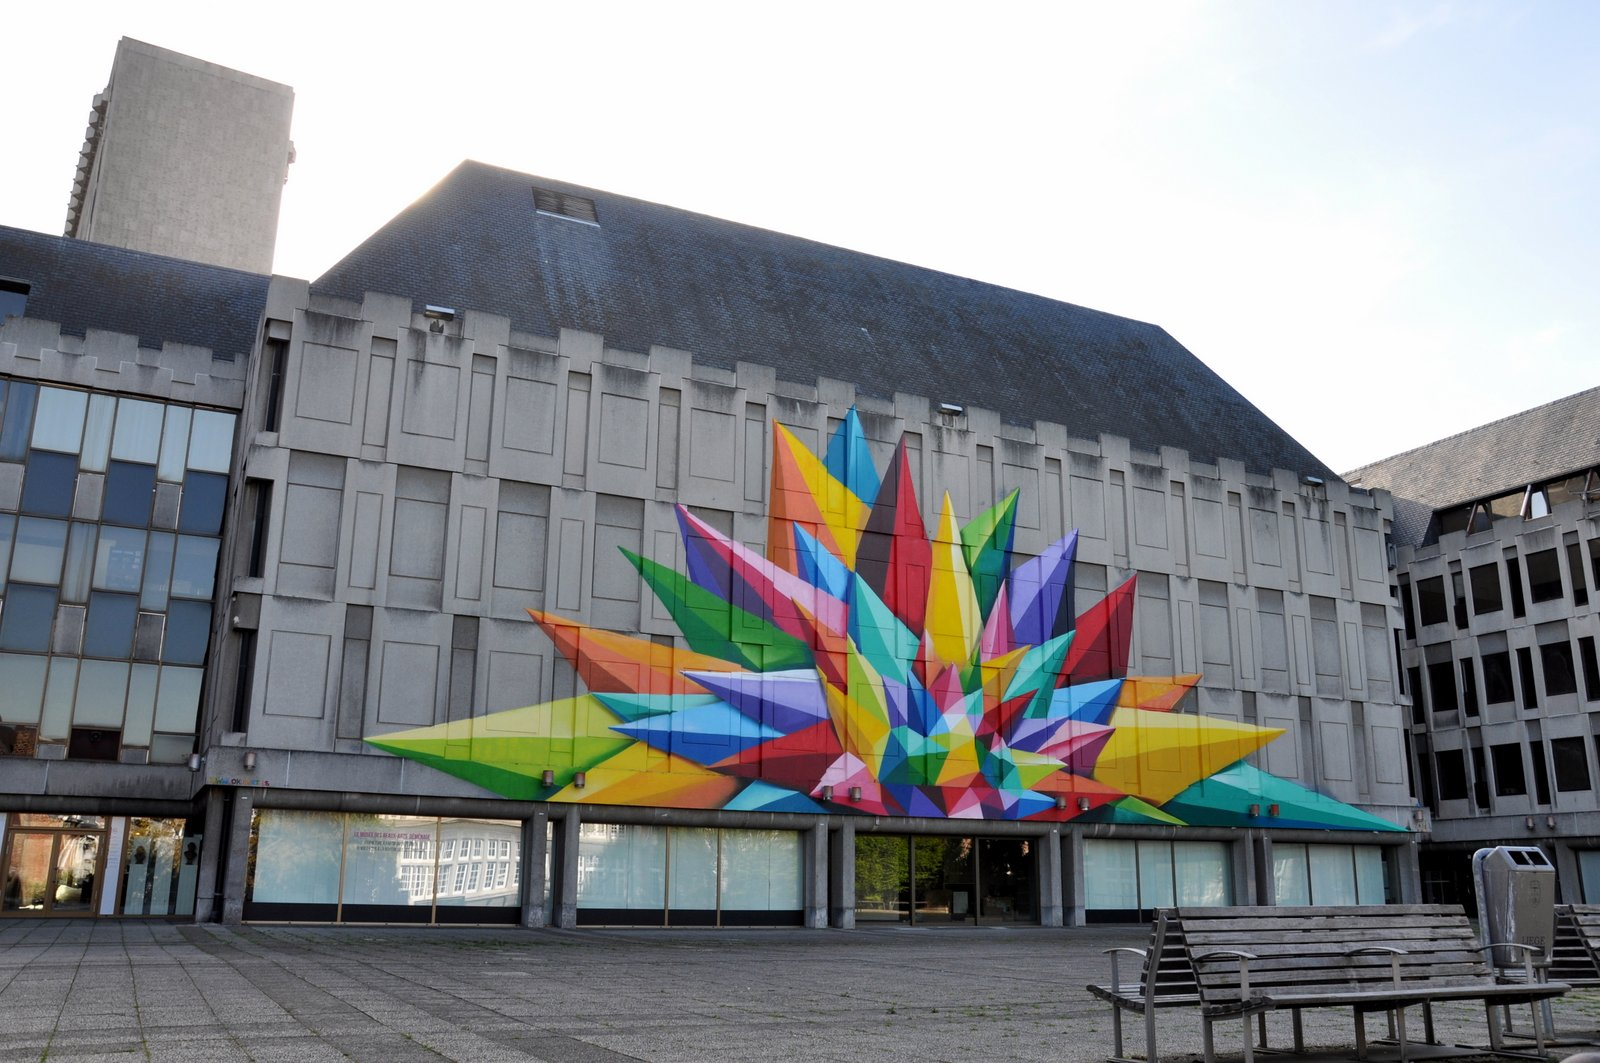 Oeuvre murale de l'artiste espagnol Okuda San Miguel à Liège